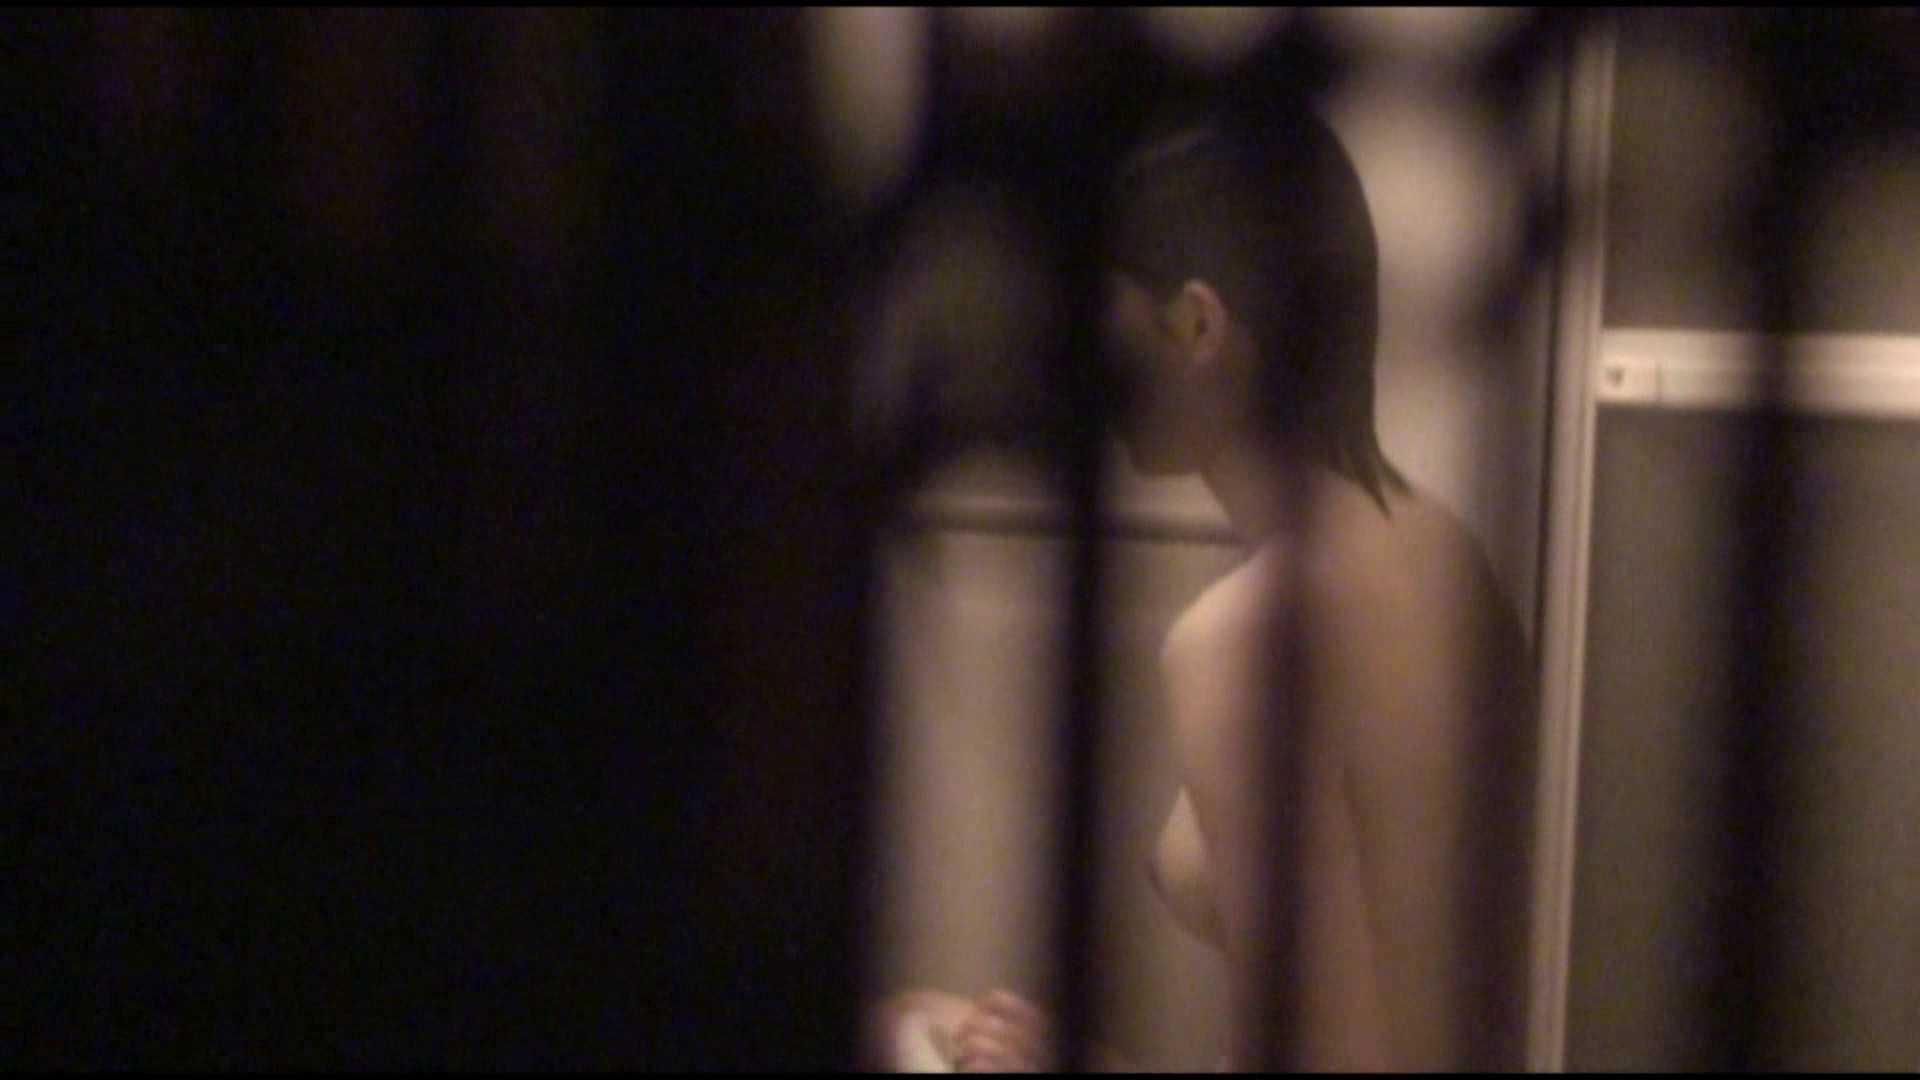 vol.05最高の極上美人!可愛い彼女の裸体をどうぞ!風呂上り鏡チェックも必見! 美人  99PIX 75